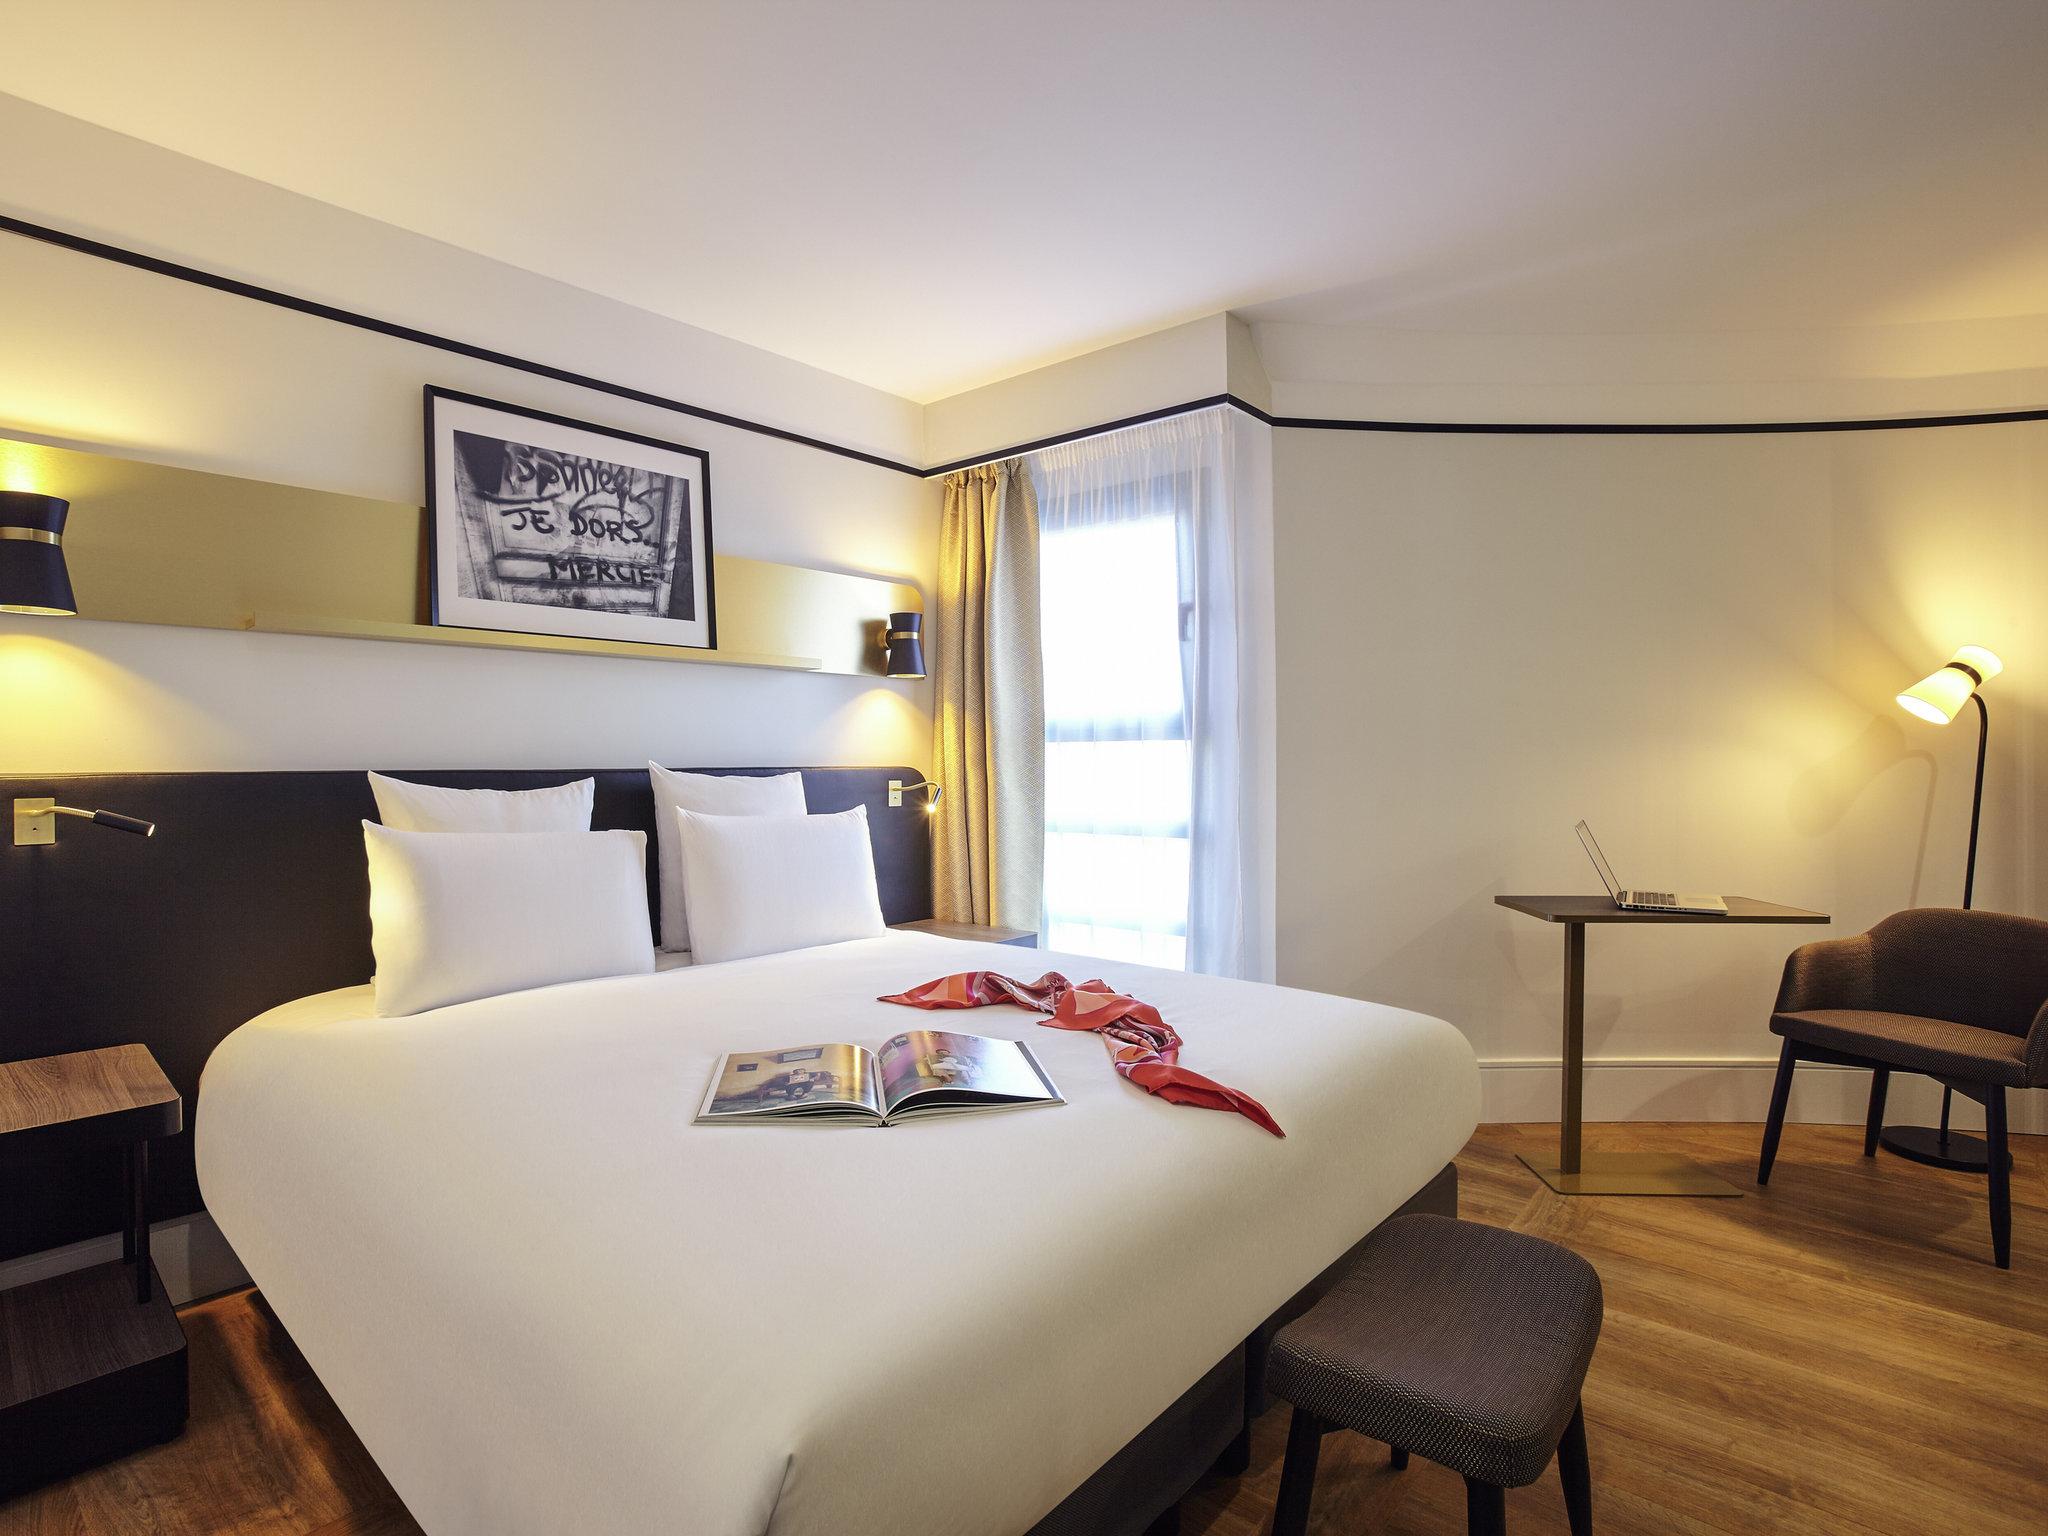 Hotel - Mercure Paris Saint-Ouen (formerly Manhattan)